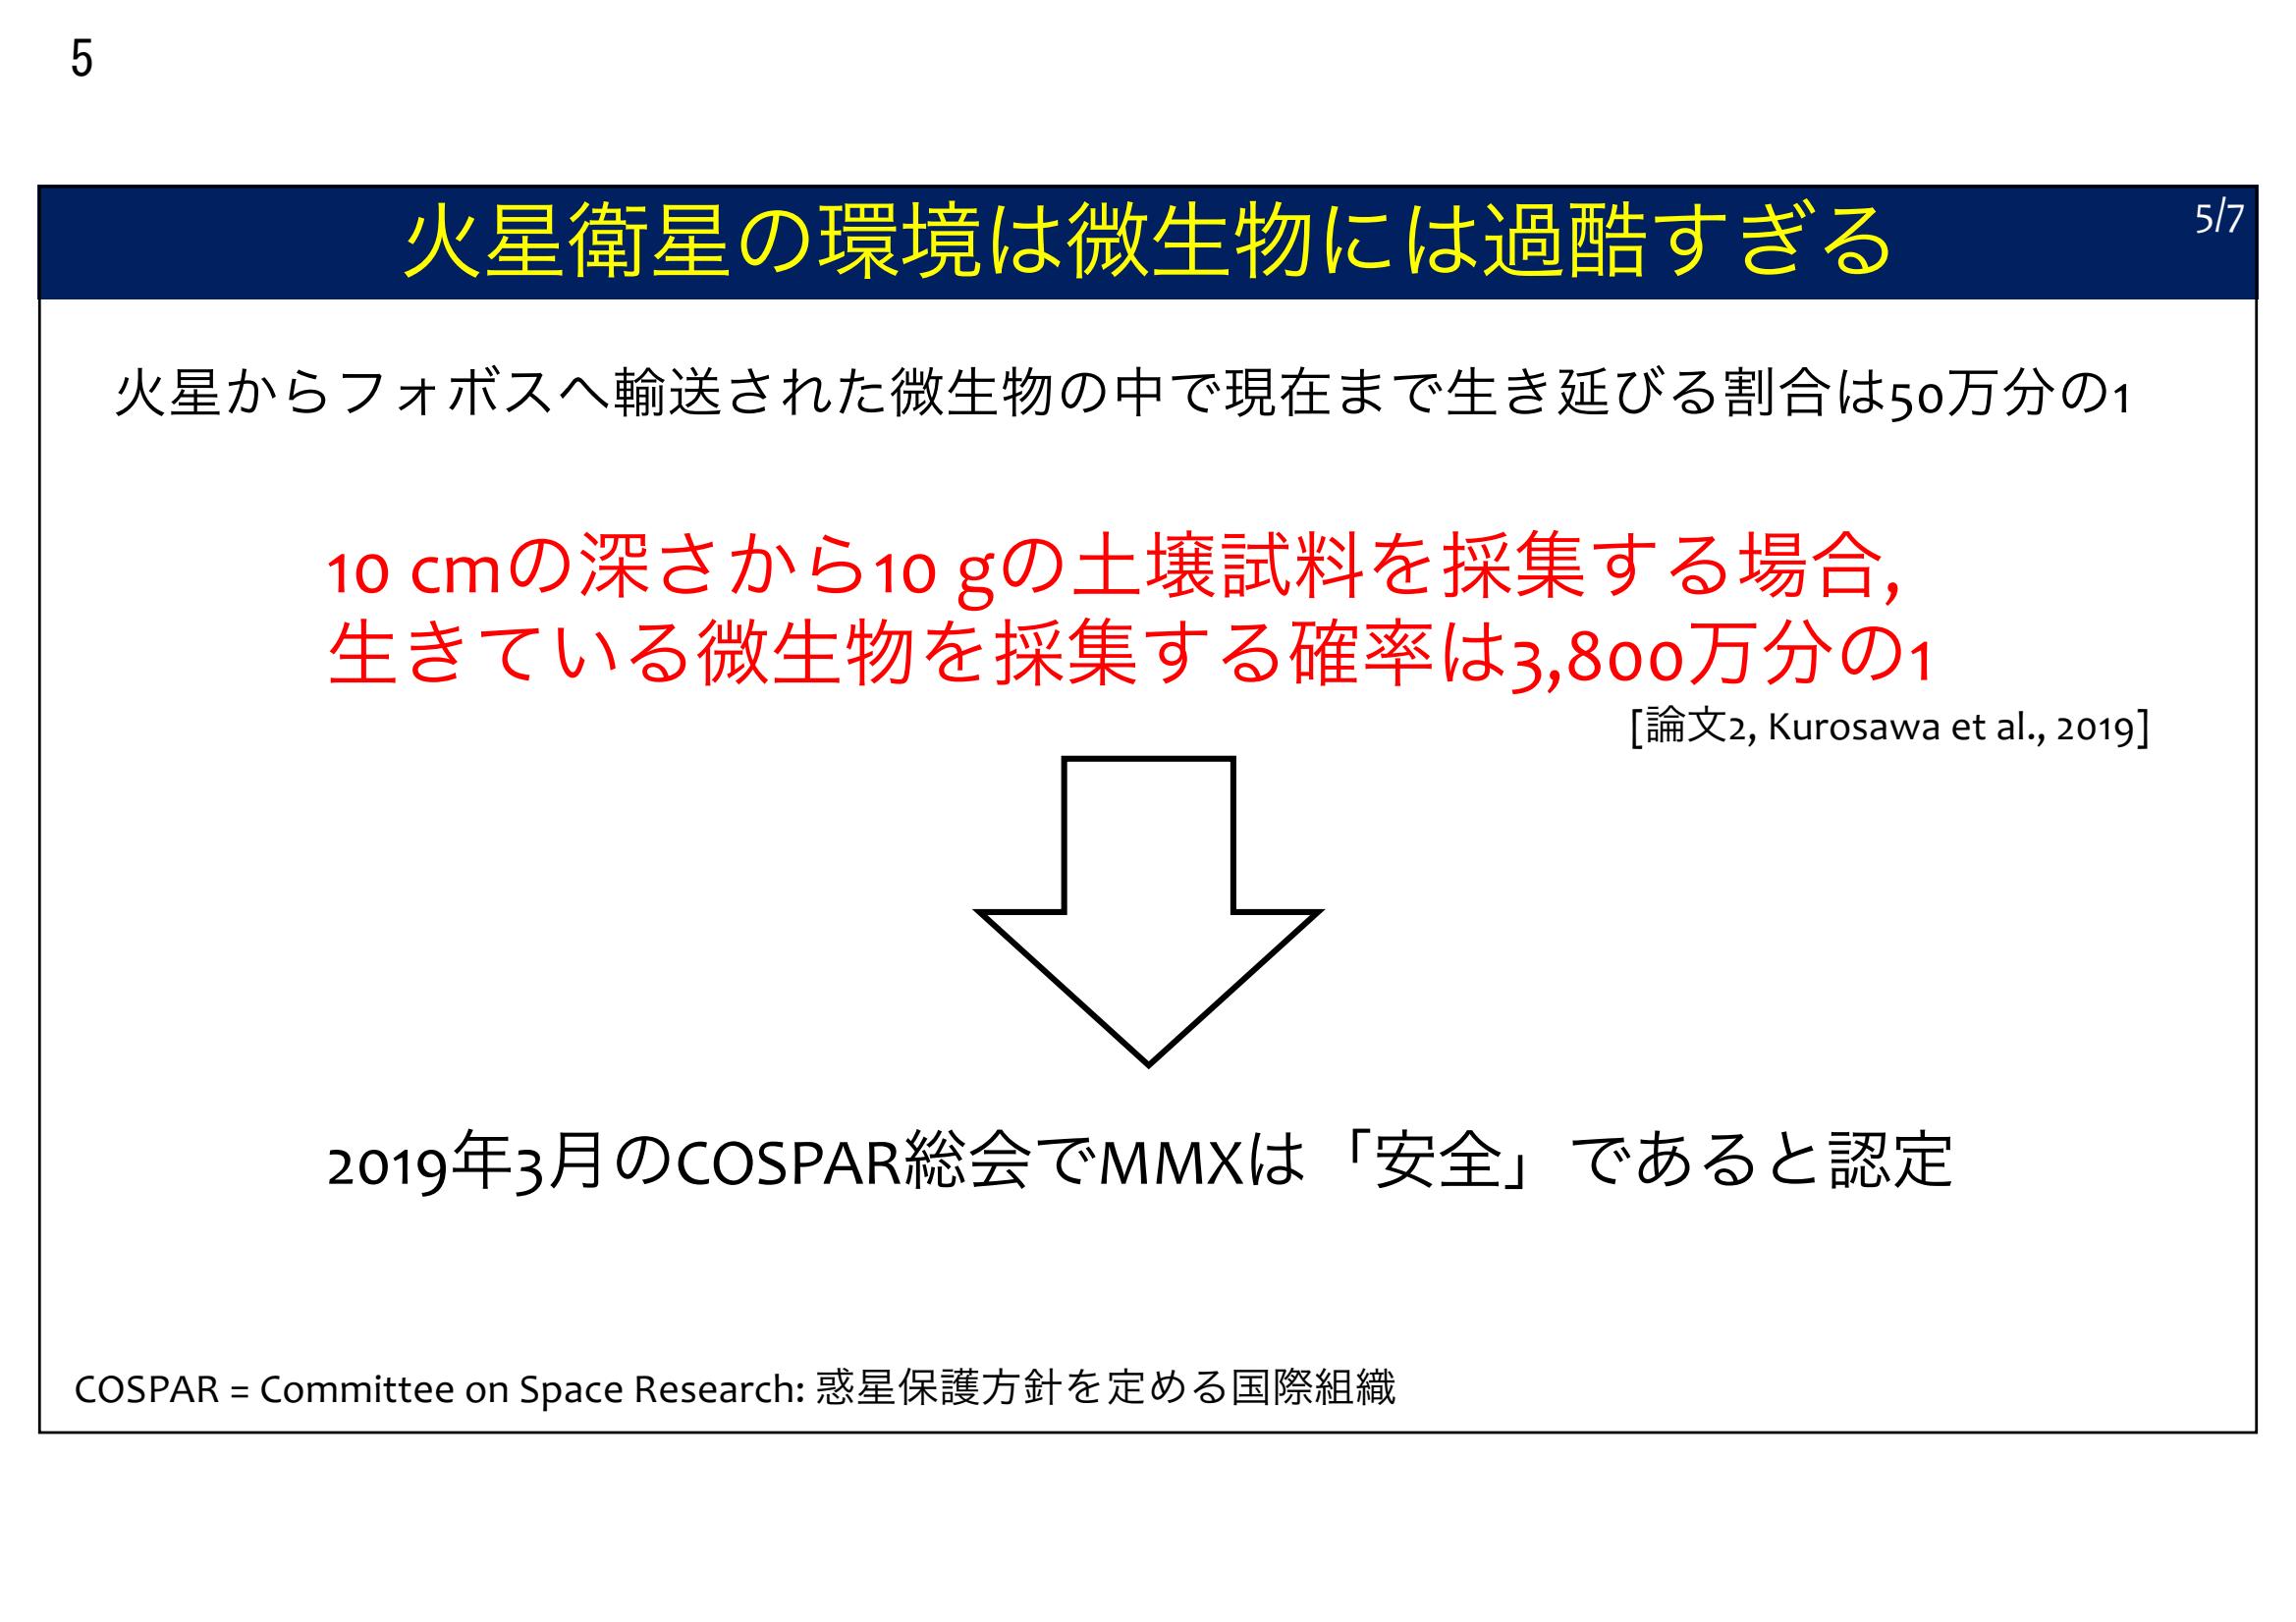 f:id:Imamura:20210819095407p:plain